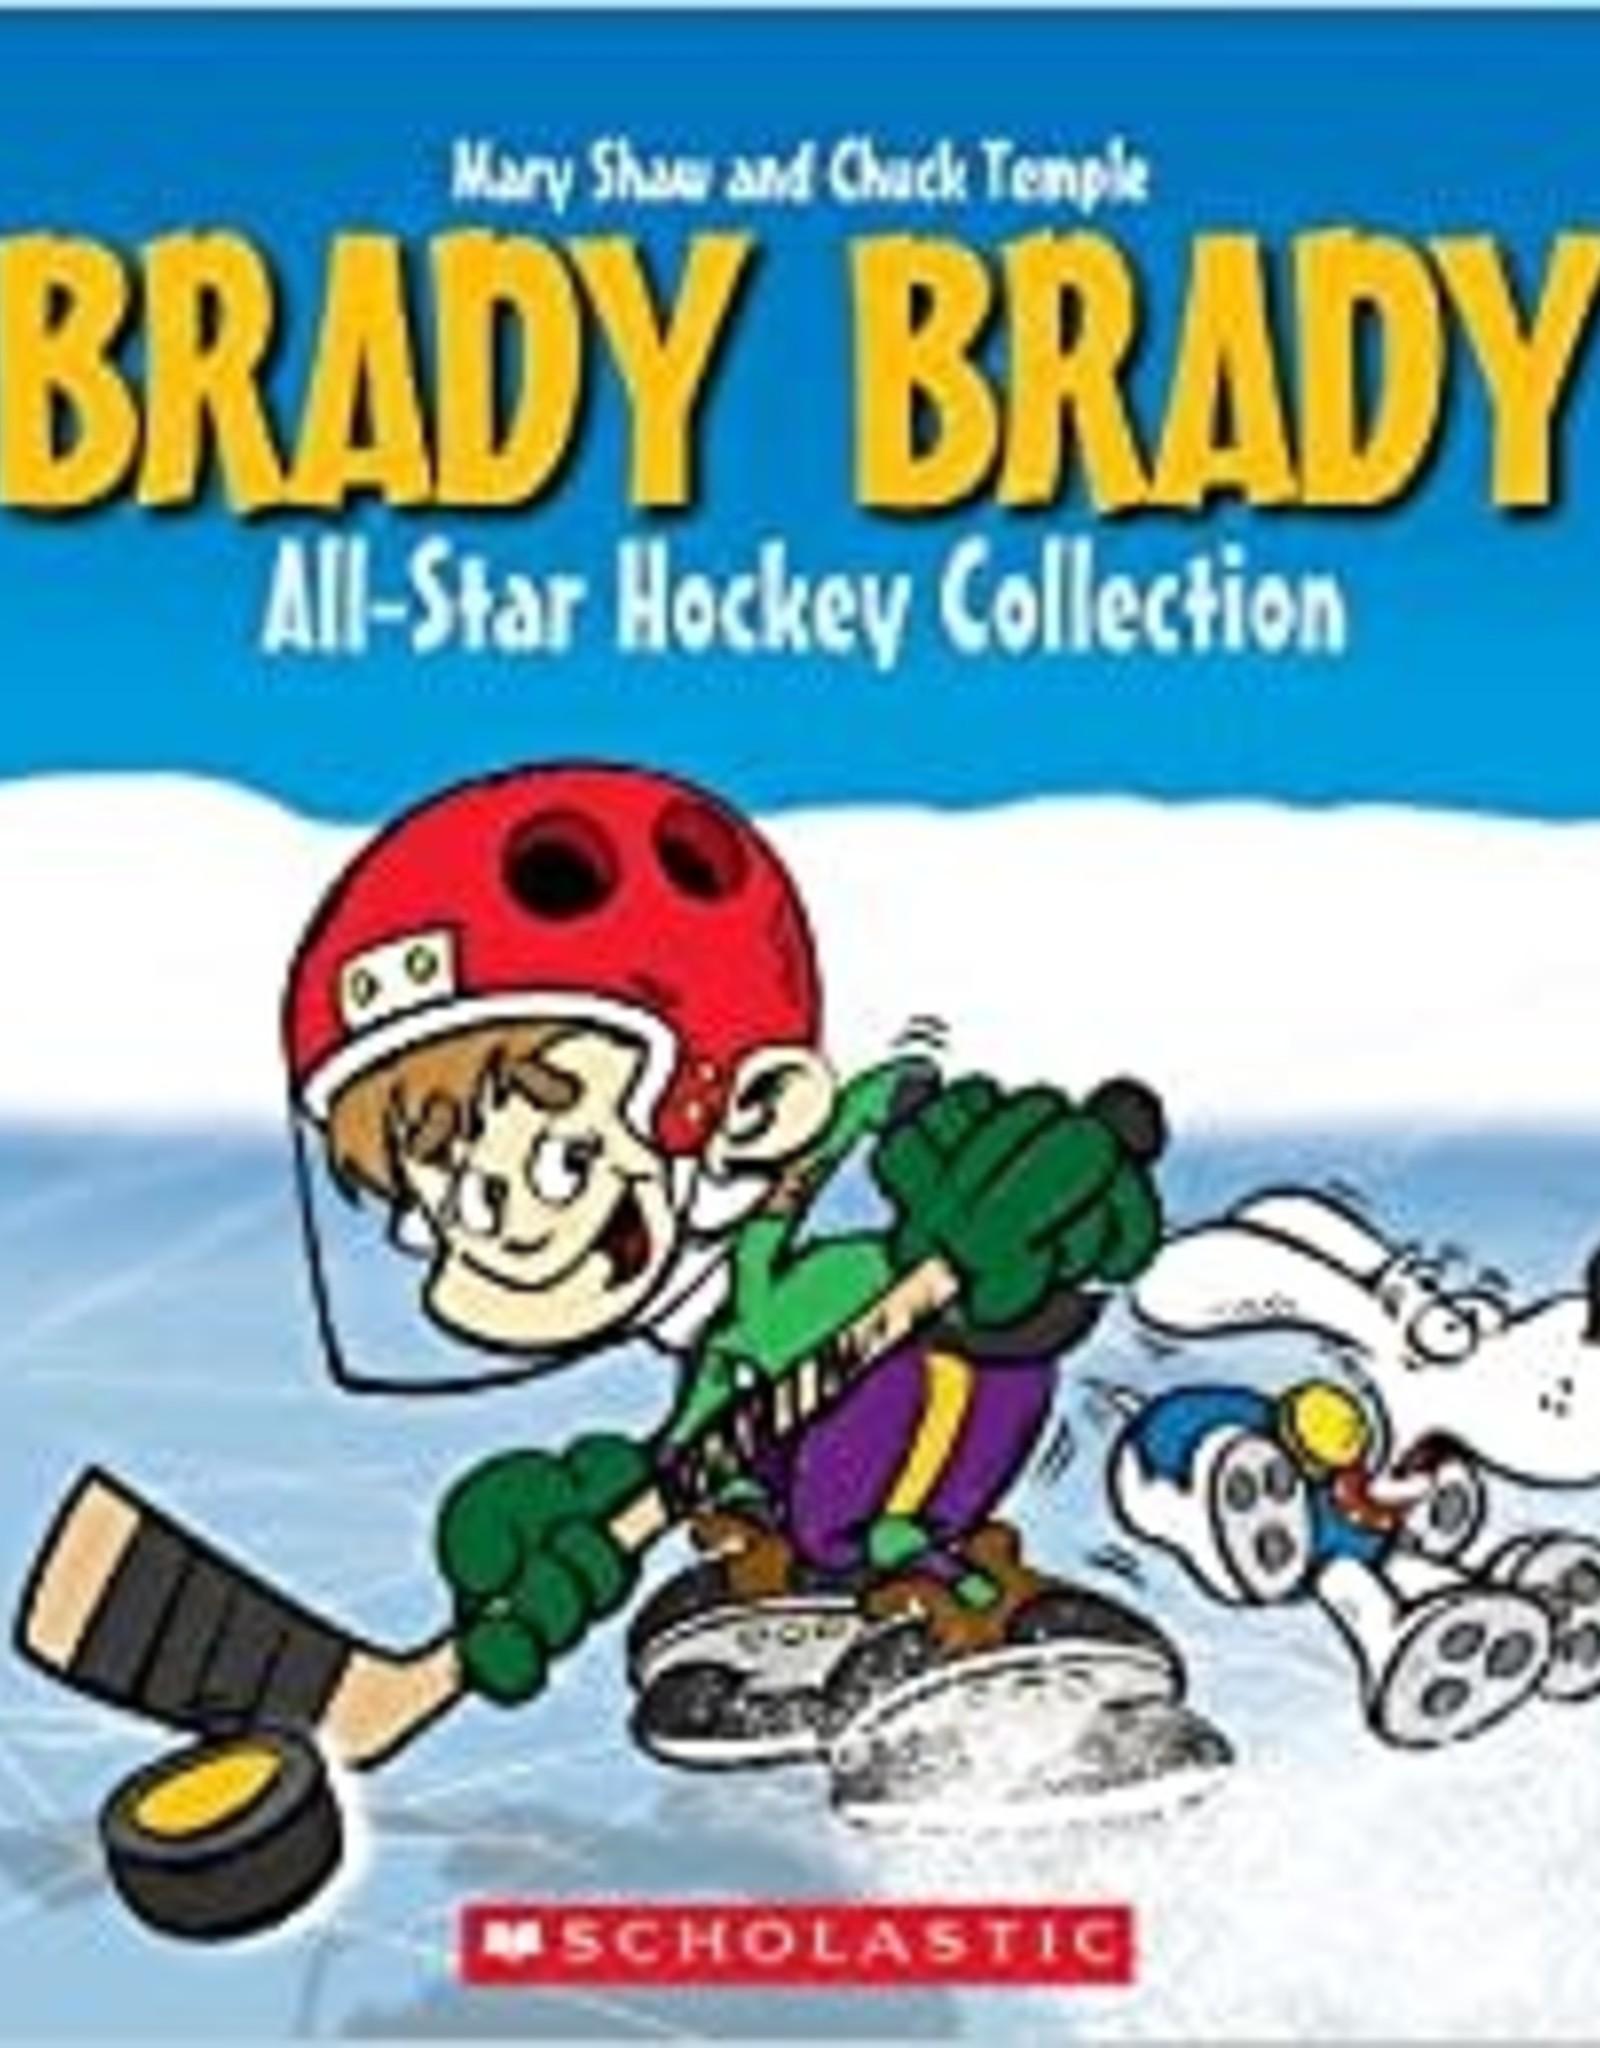 Scholastic Brady Brady All-Star Hockey Collection